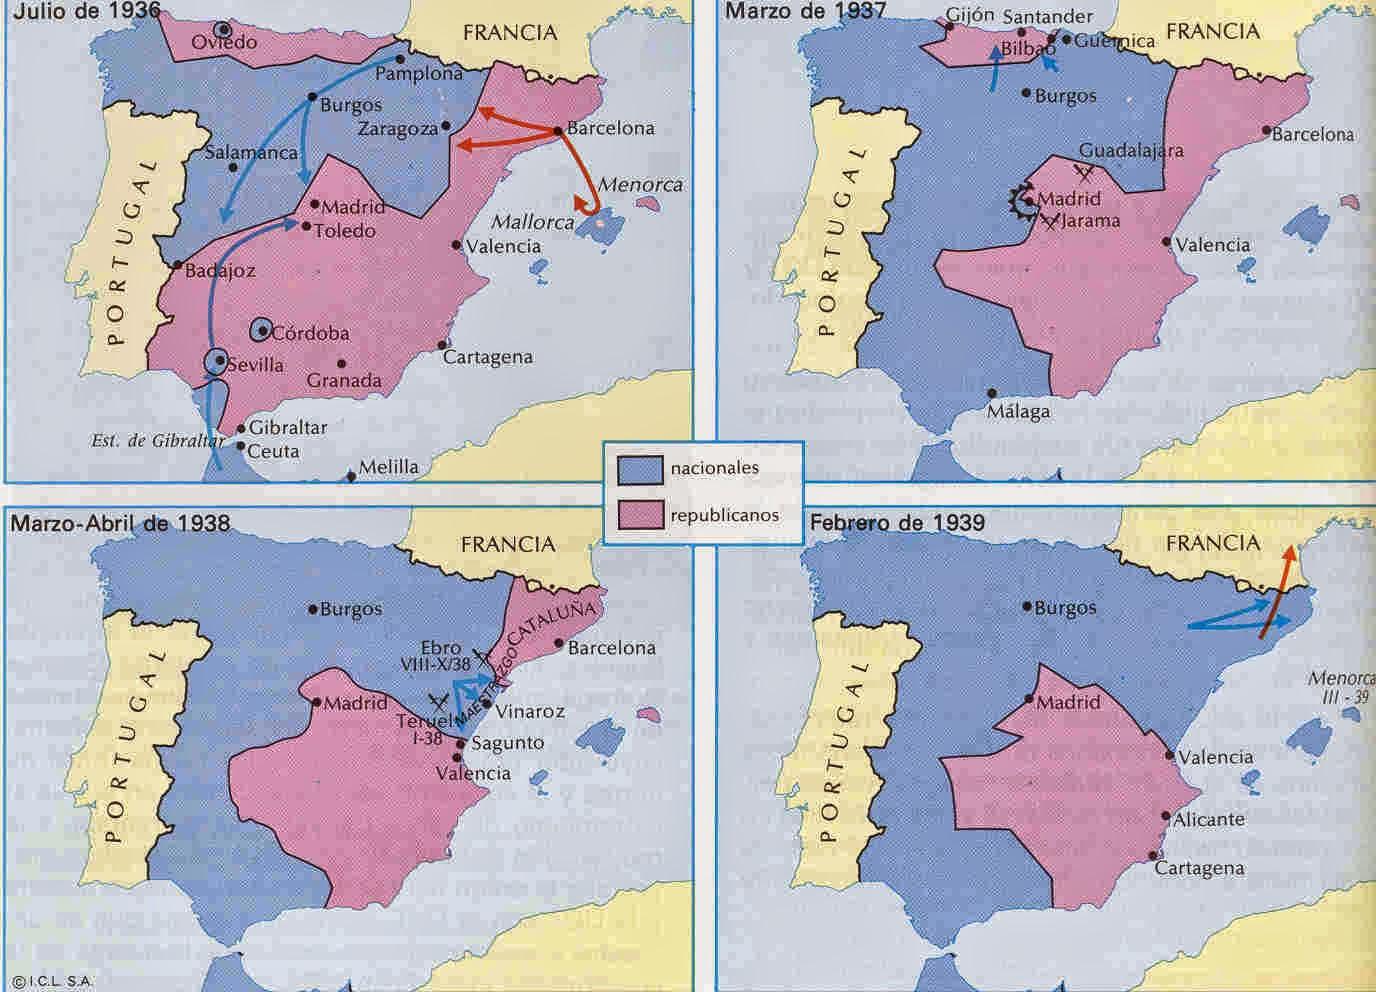 http://3.bp.blogspot.com/-wjVbDC0HNA4/UfPKUTeJiYI/AAAAAAAAEDg/wjRoQy5gFUU/s1600/guerra-civil-espa%C3%B1ola-mapa.jpg